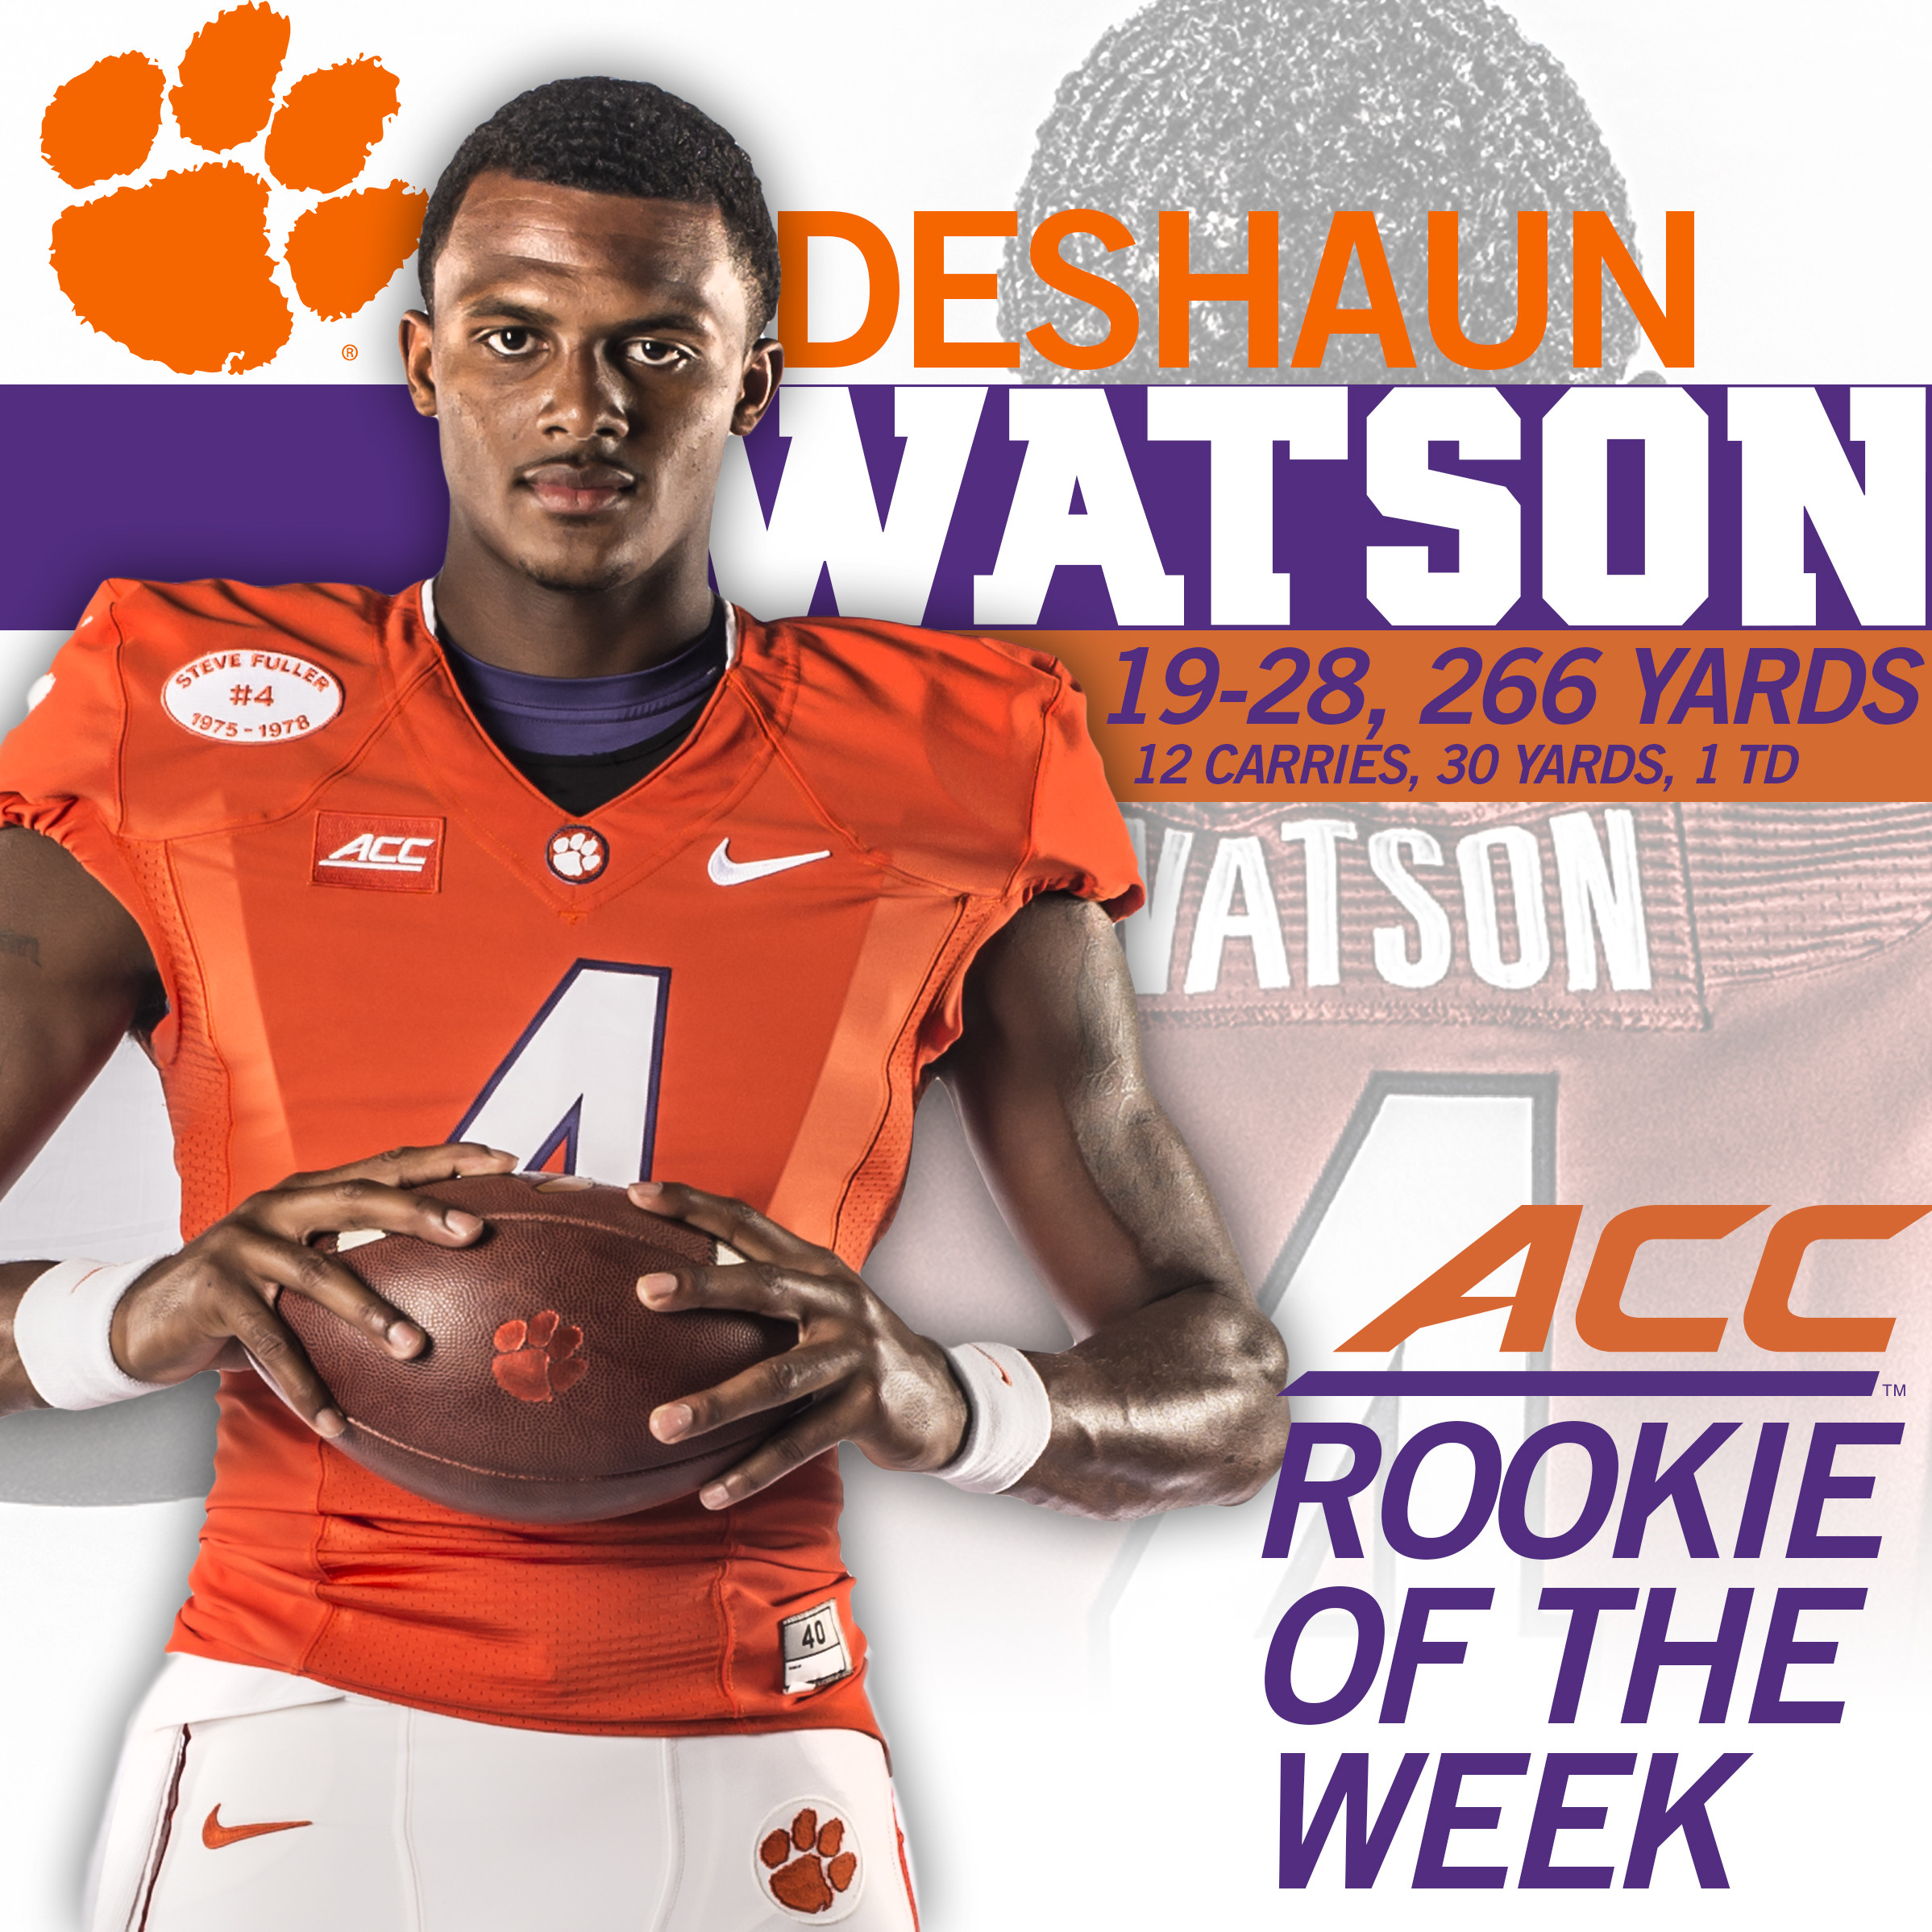 Watson named ACC Rookie of the Week